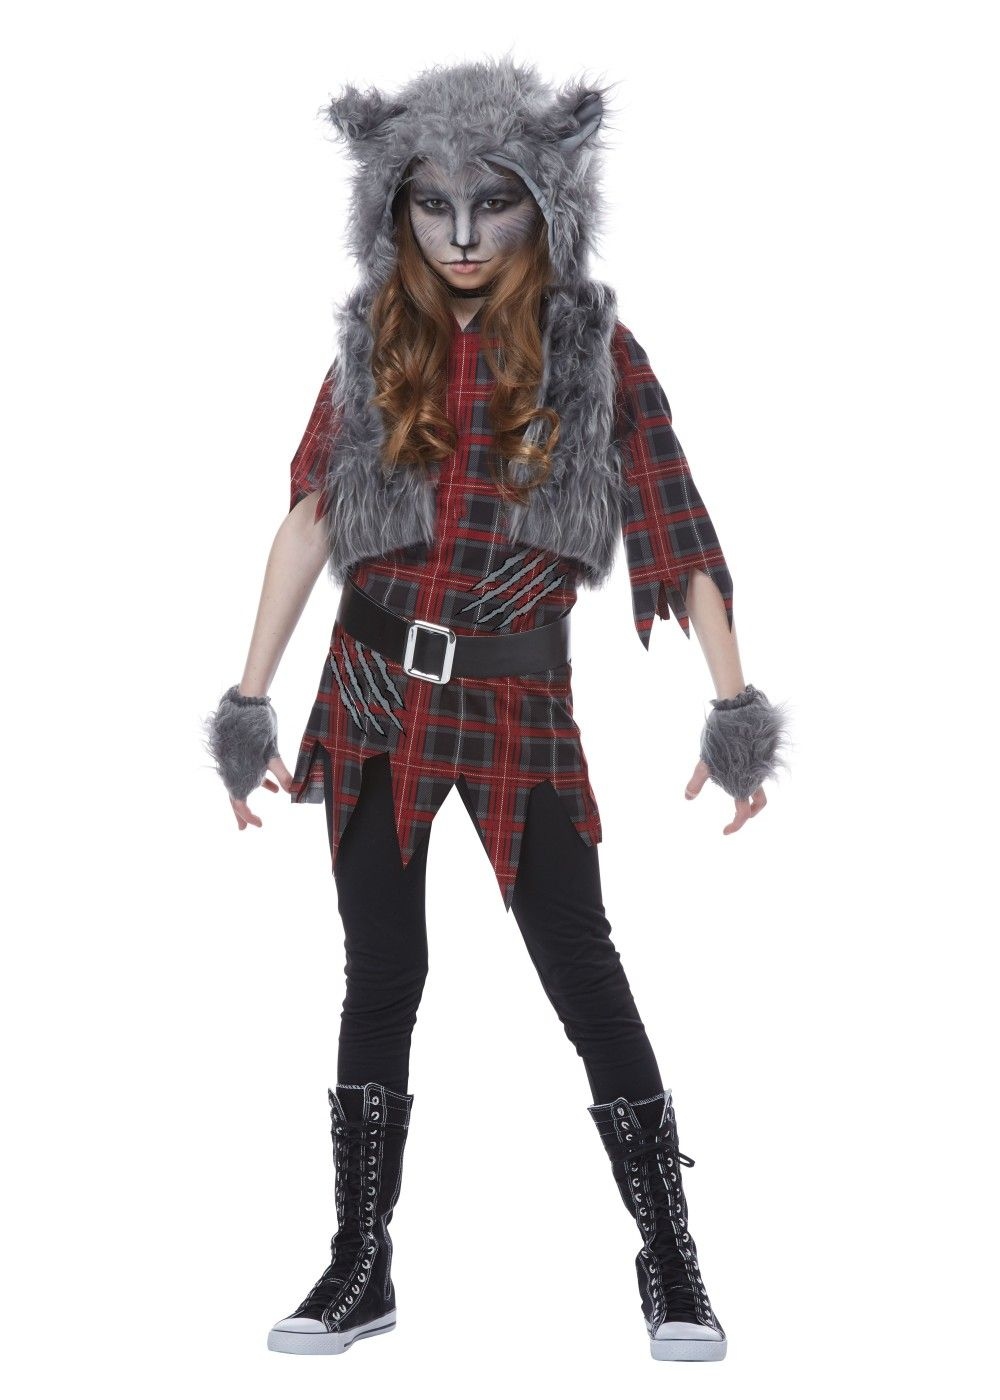 Werewolf Girls Costume Guide 2017 Costumes